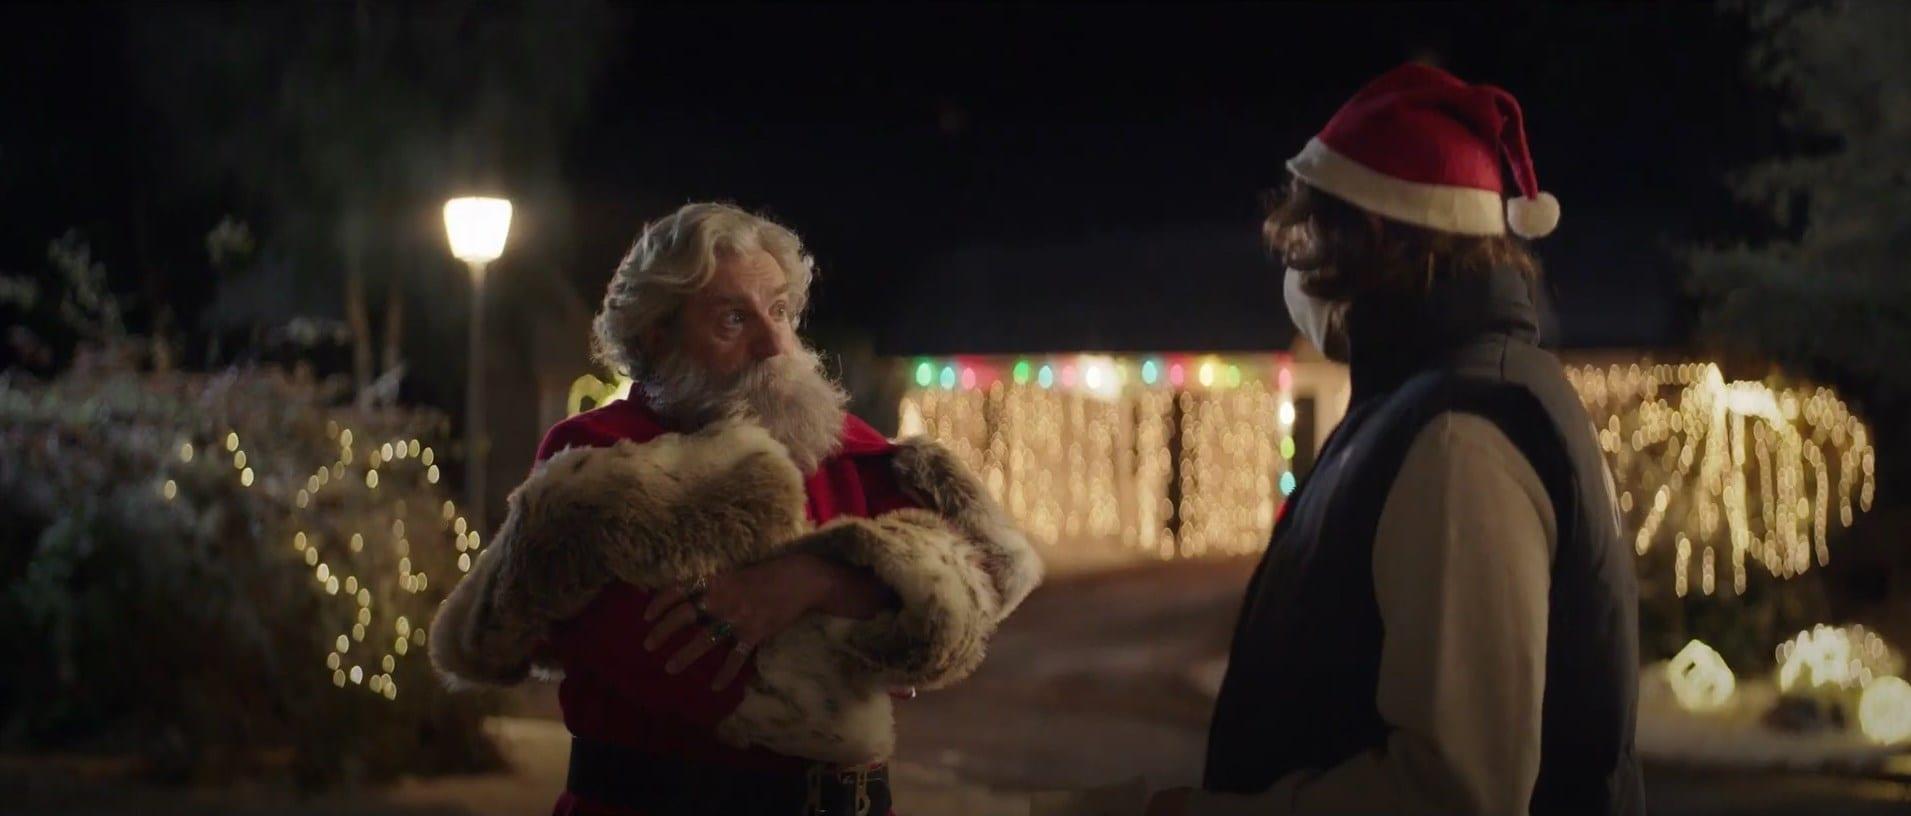 Carrefour Christmas Ad 2020